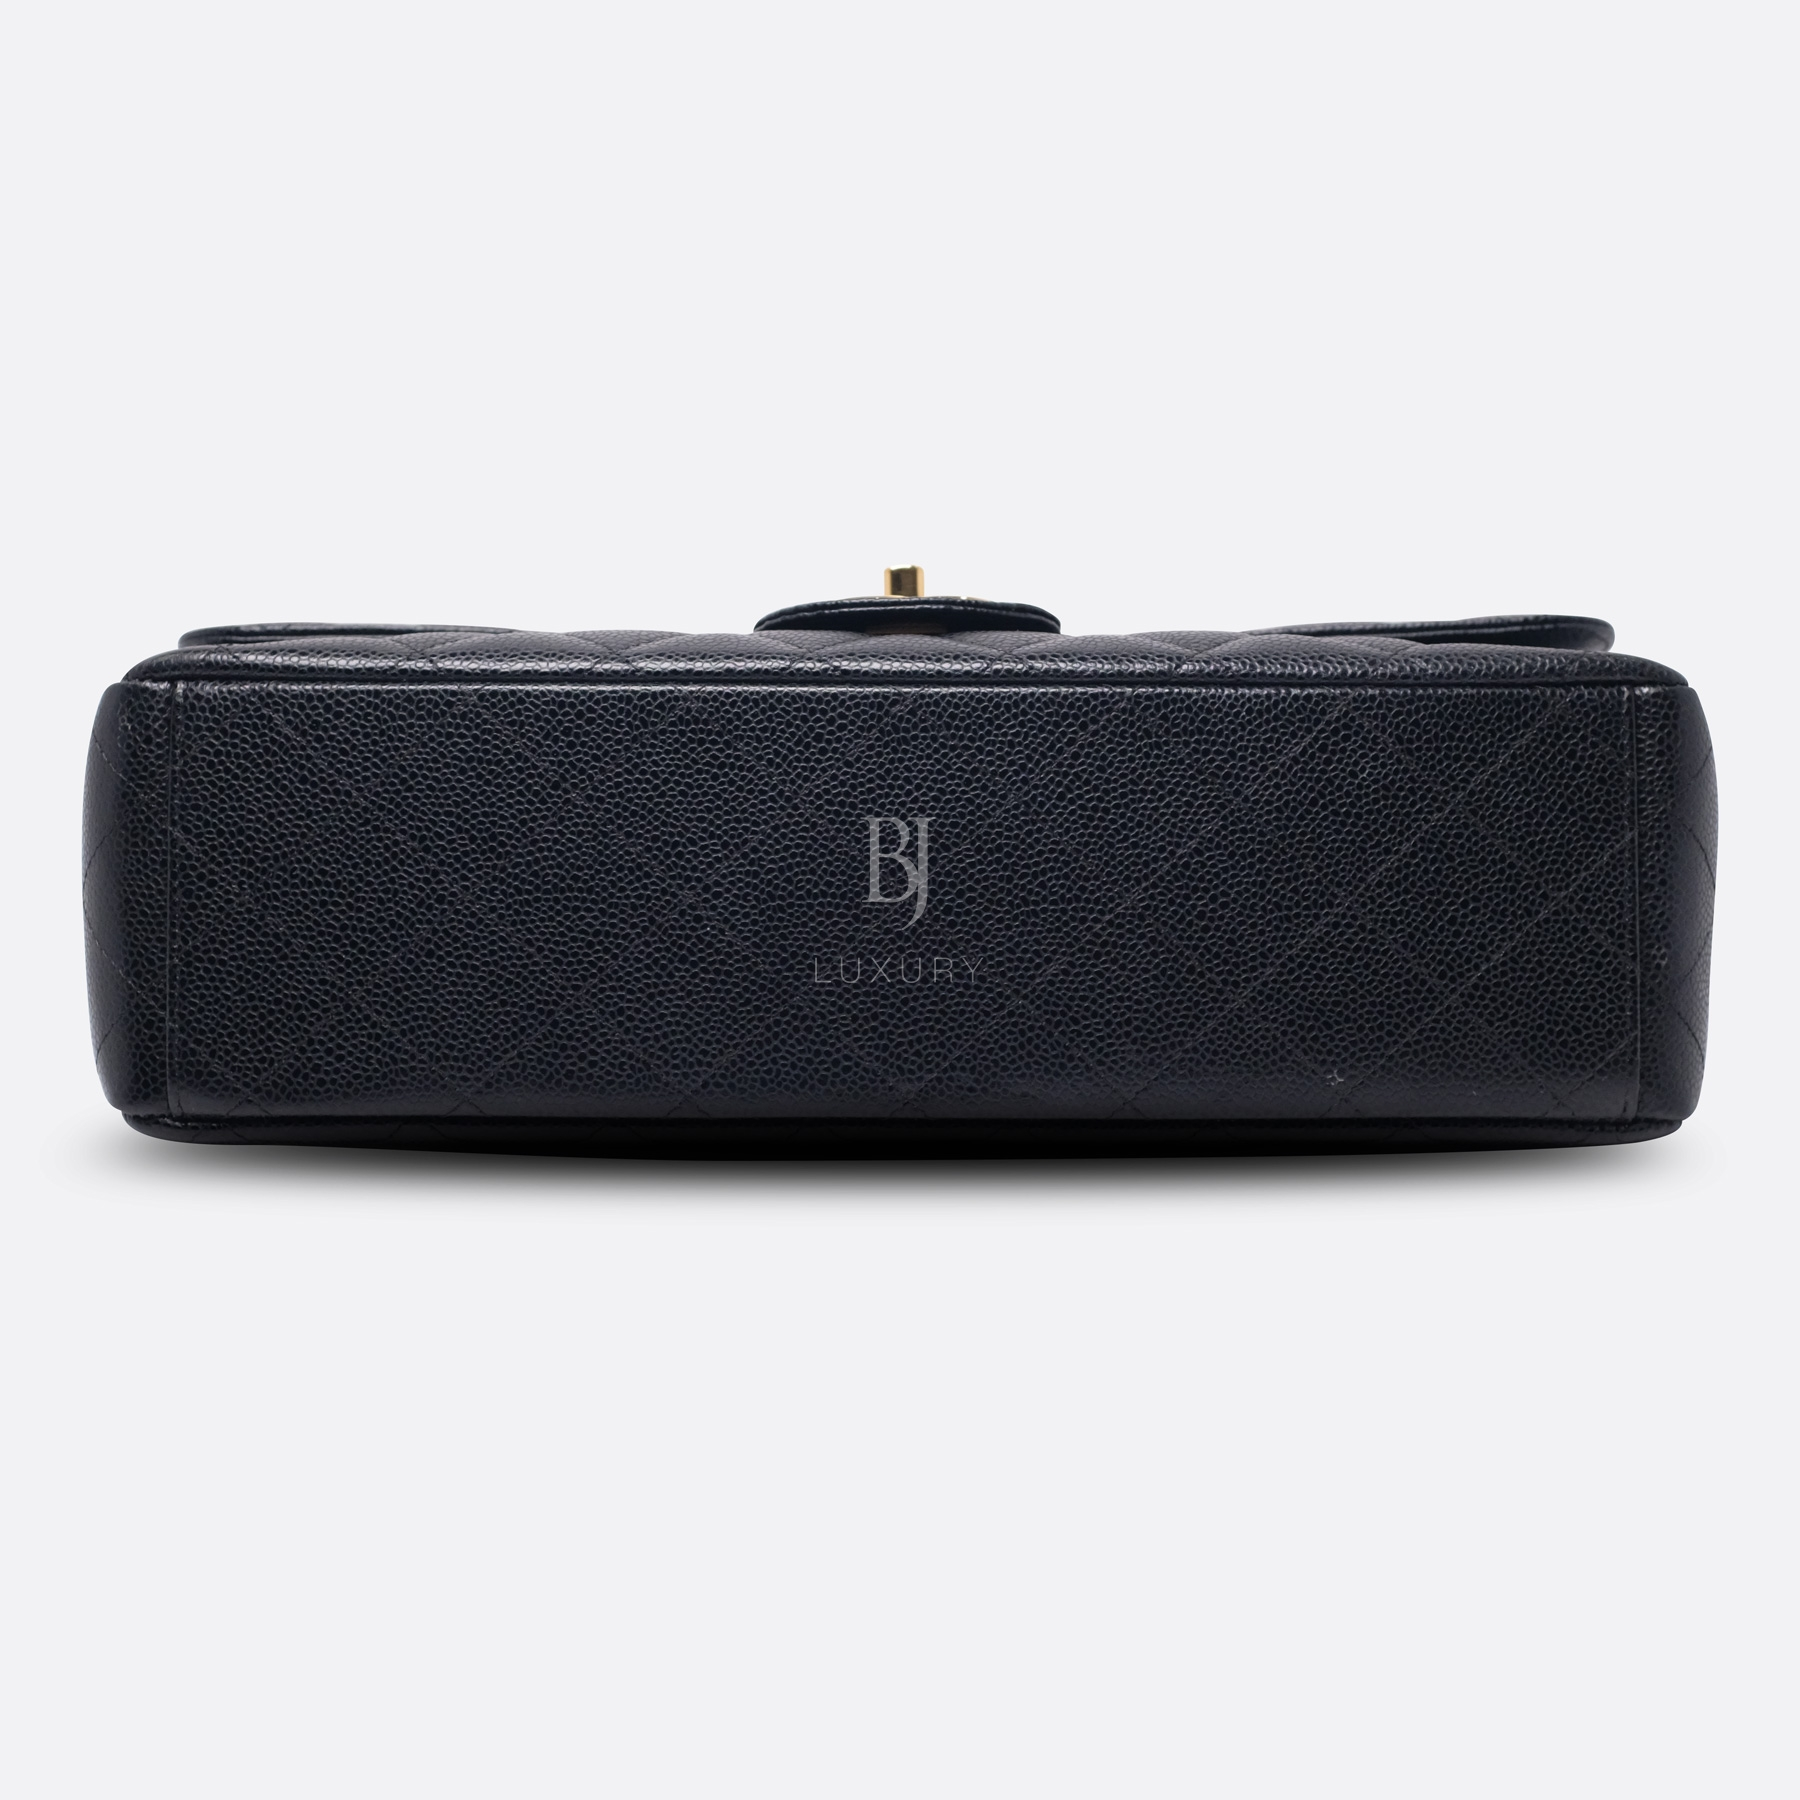 Chanel Classic Handbag Caviar Maxi Black BJ Luxury 7.jpg